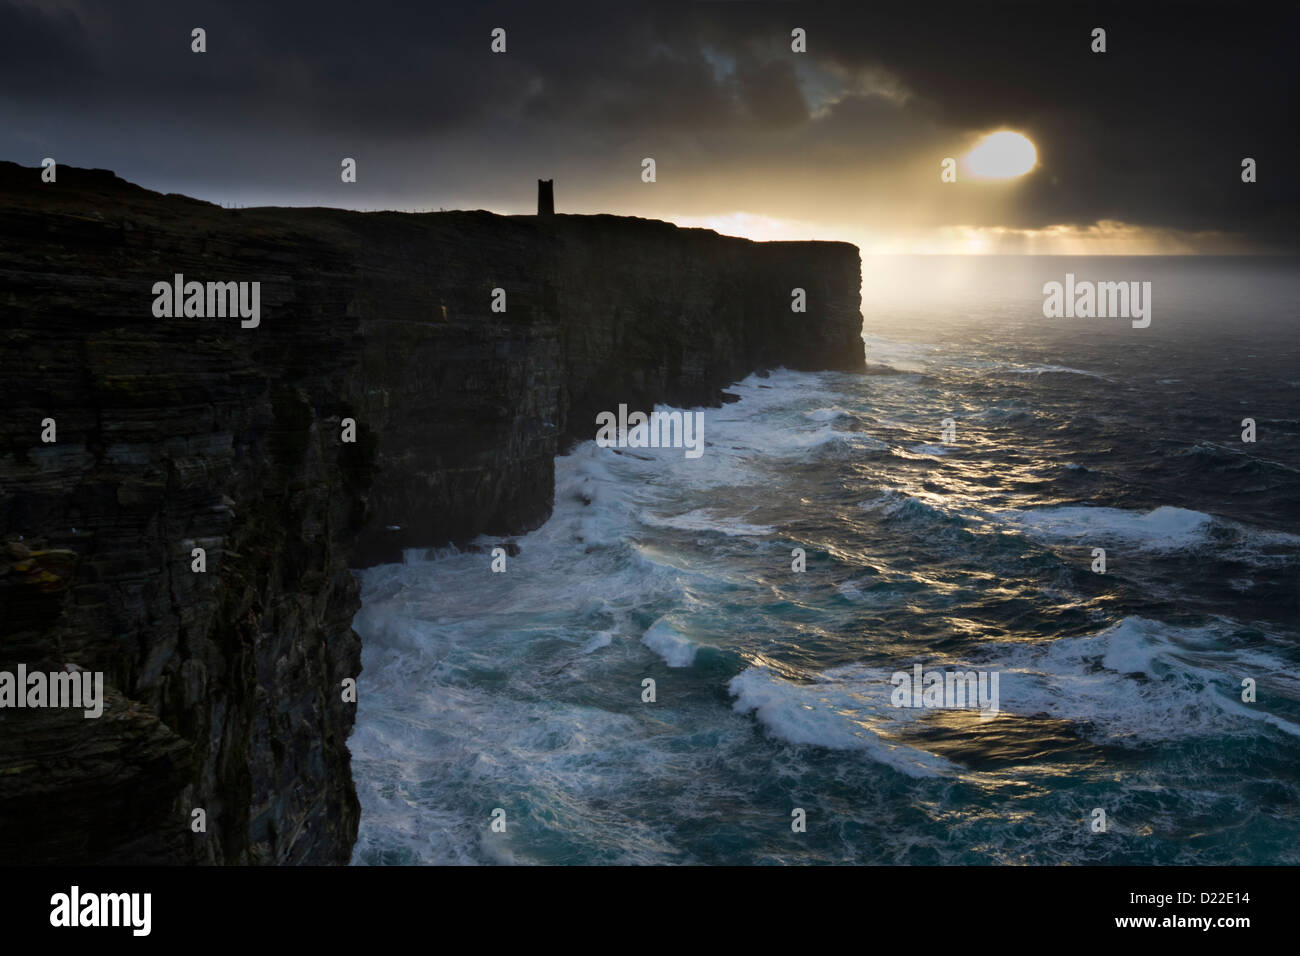 Luce drammatica a Marwick Testa, Orkney Isles Immagini Stock